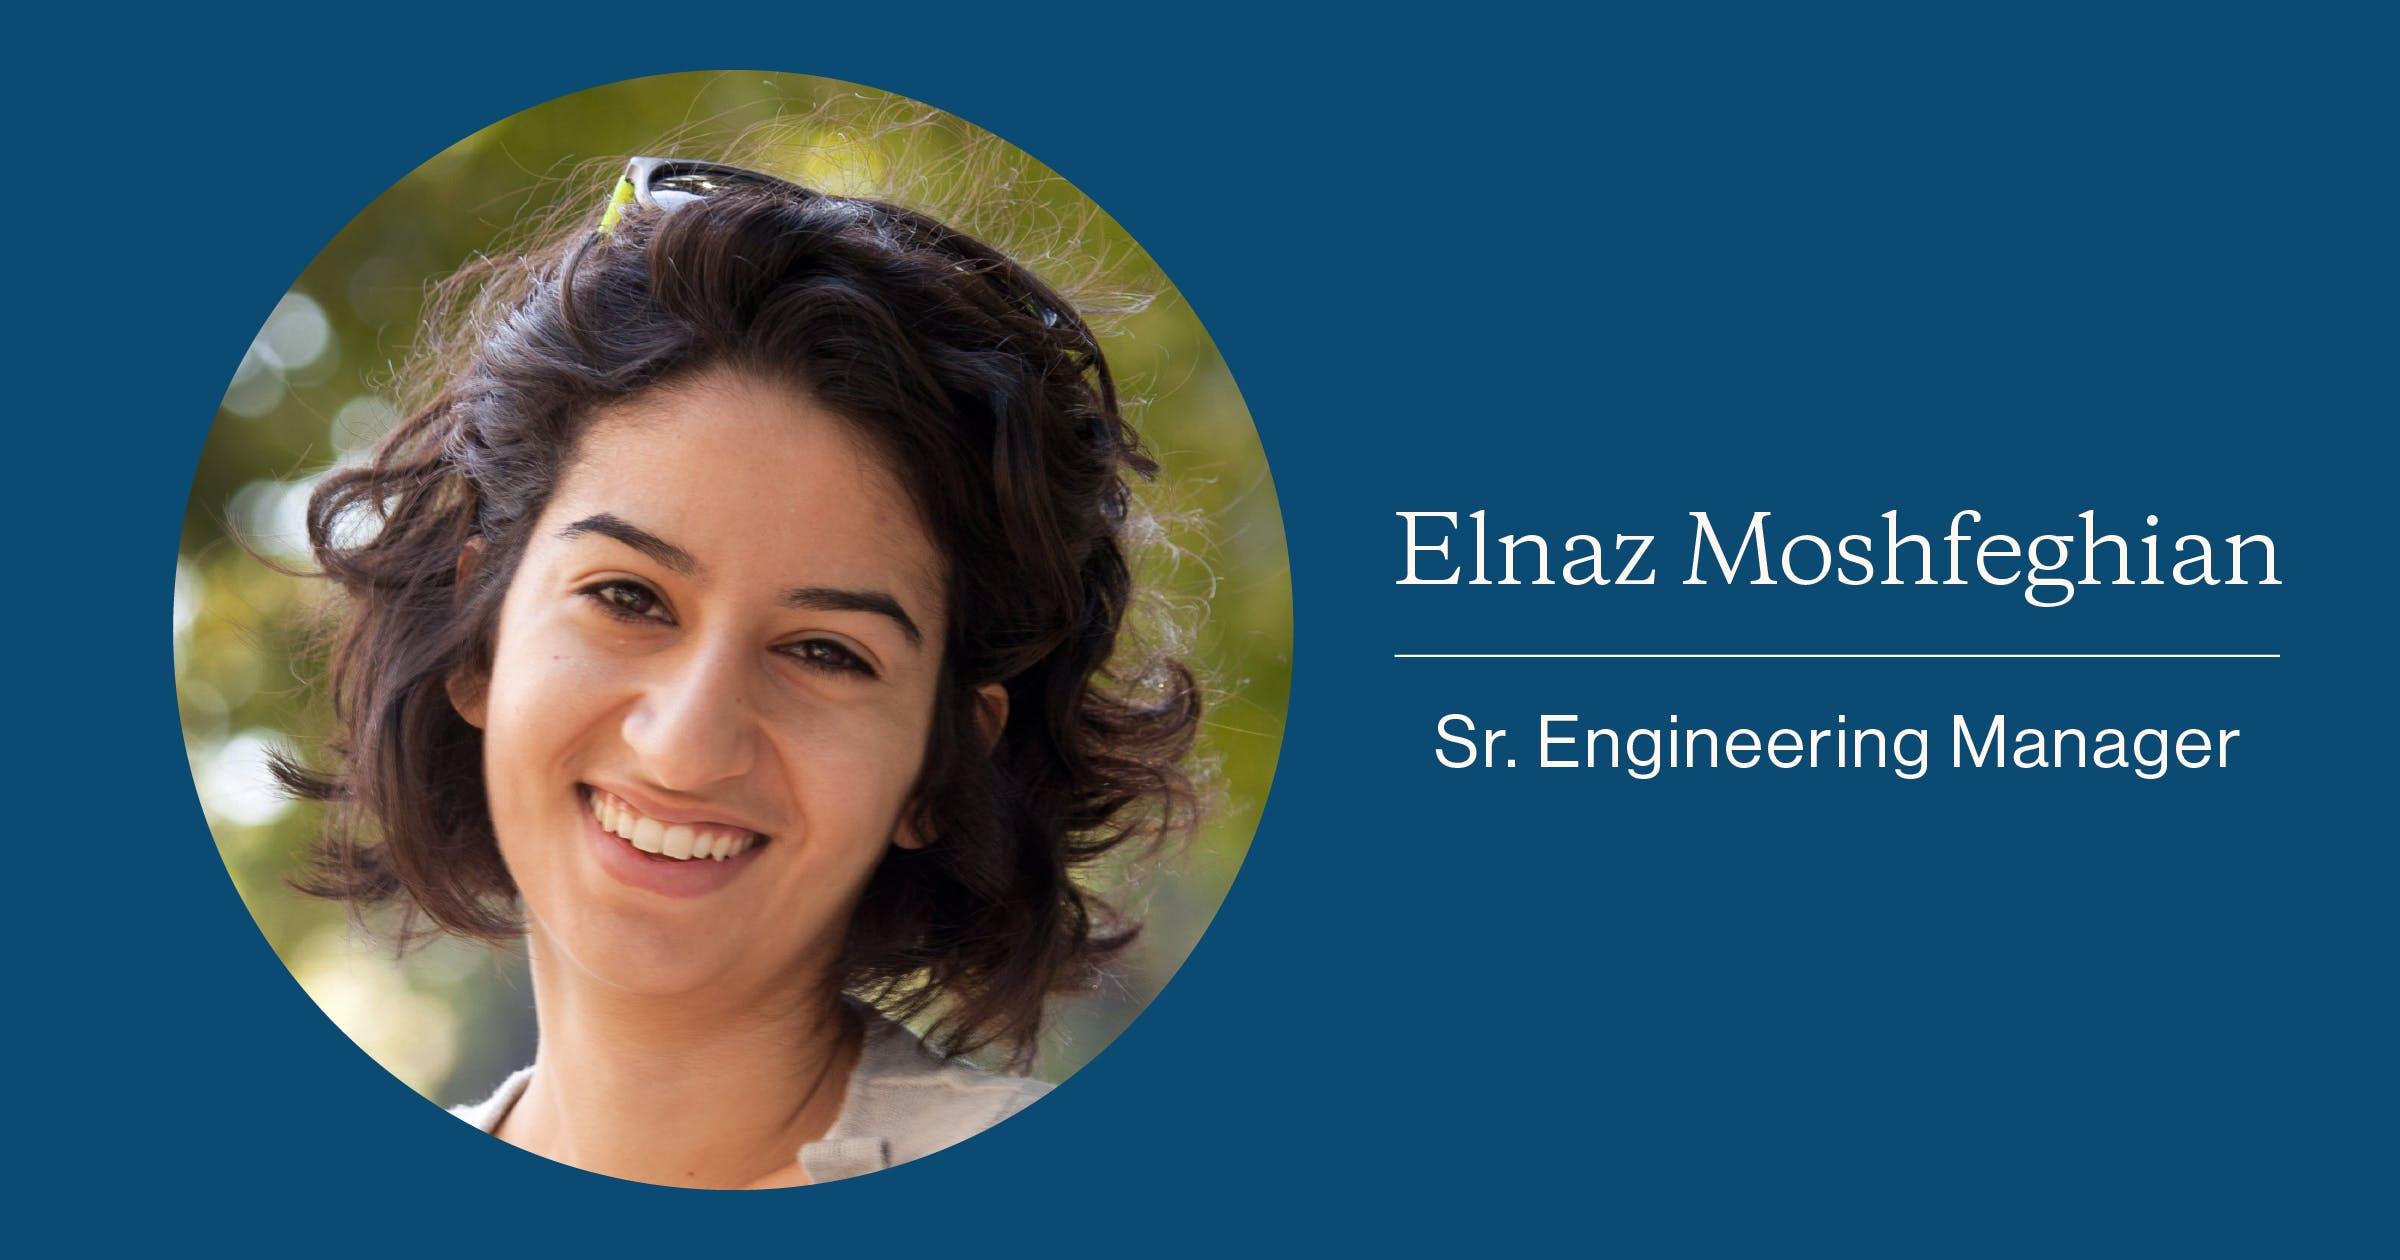 Elnaz Moshfeghihan, Senior Engineering Manager